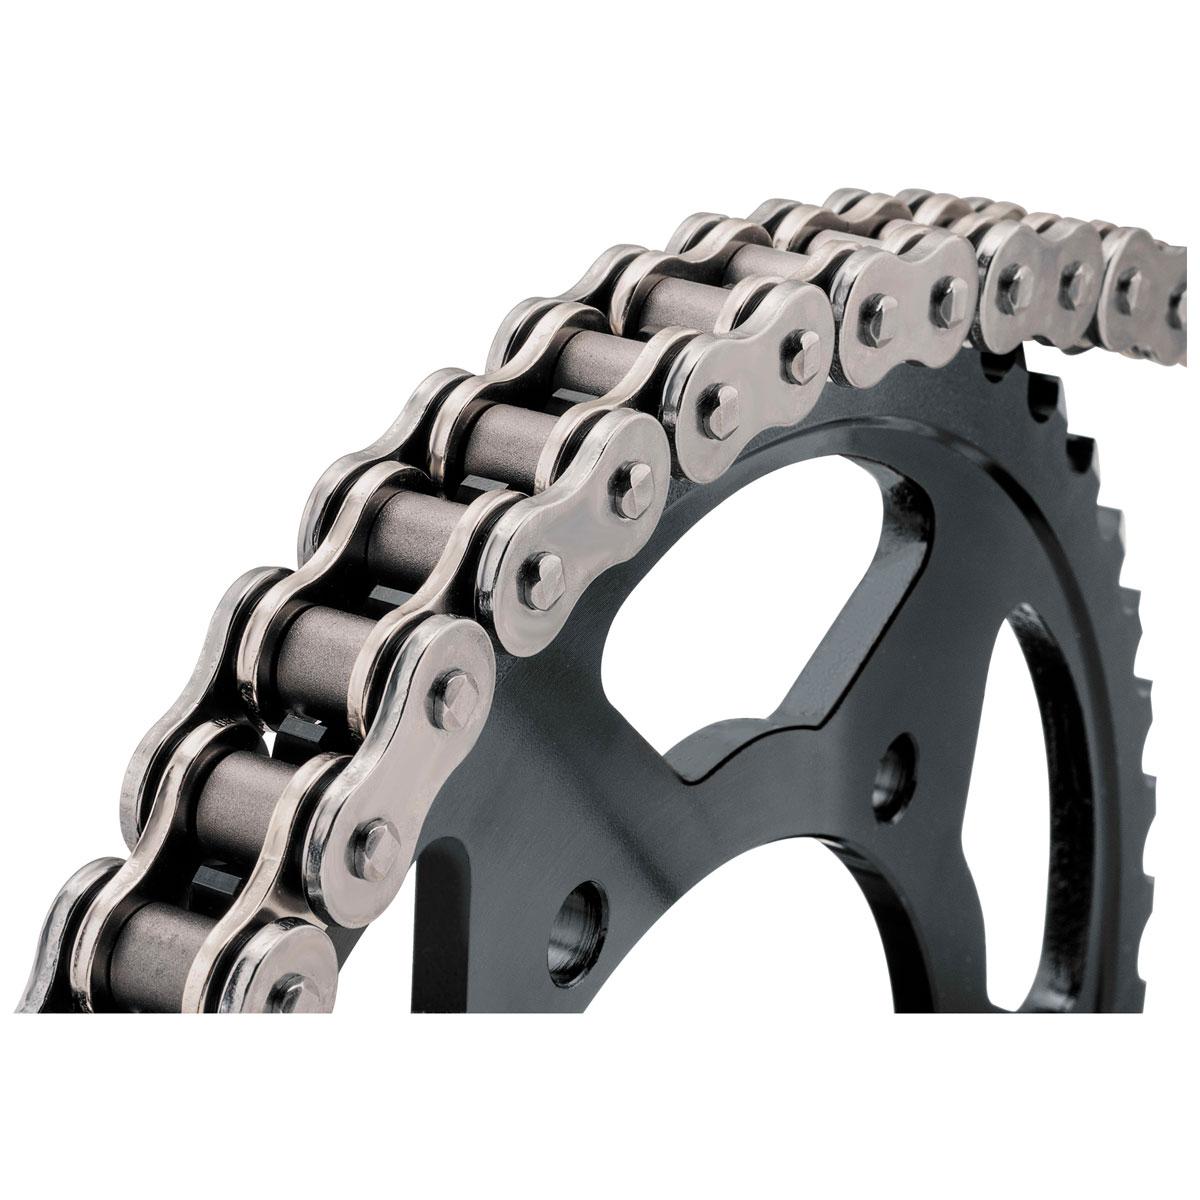 BikeMaster 520 BMOR O-ring Chain Natural